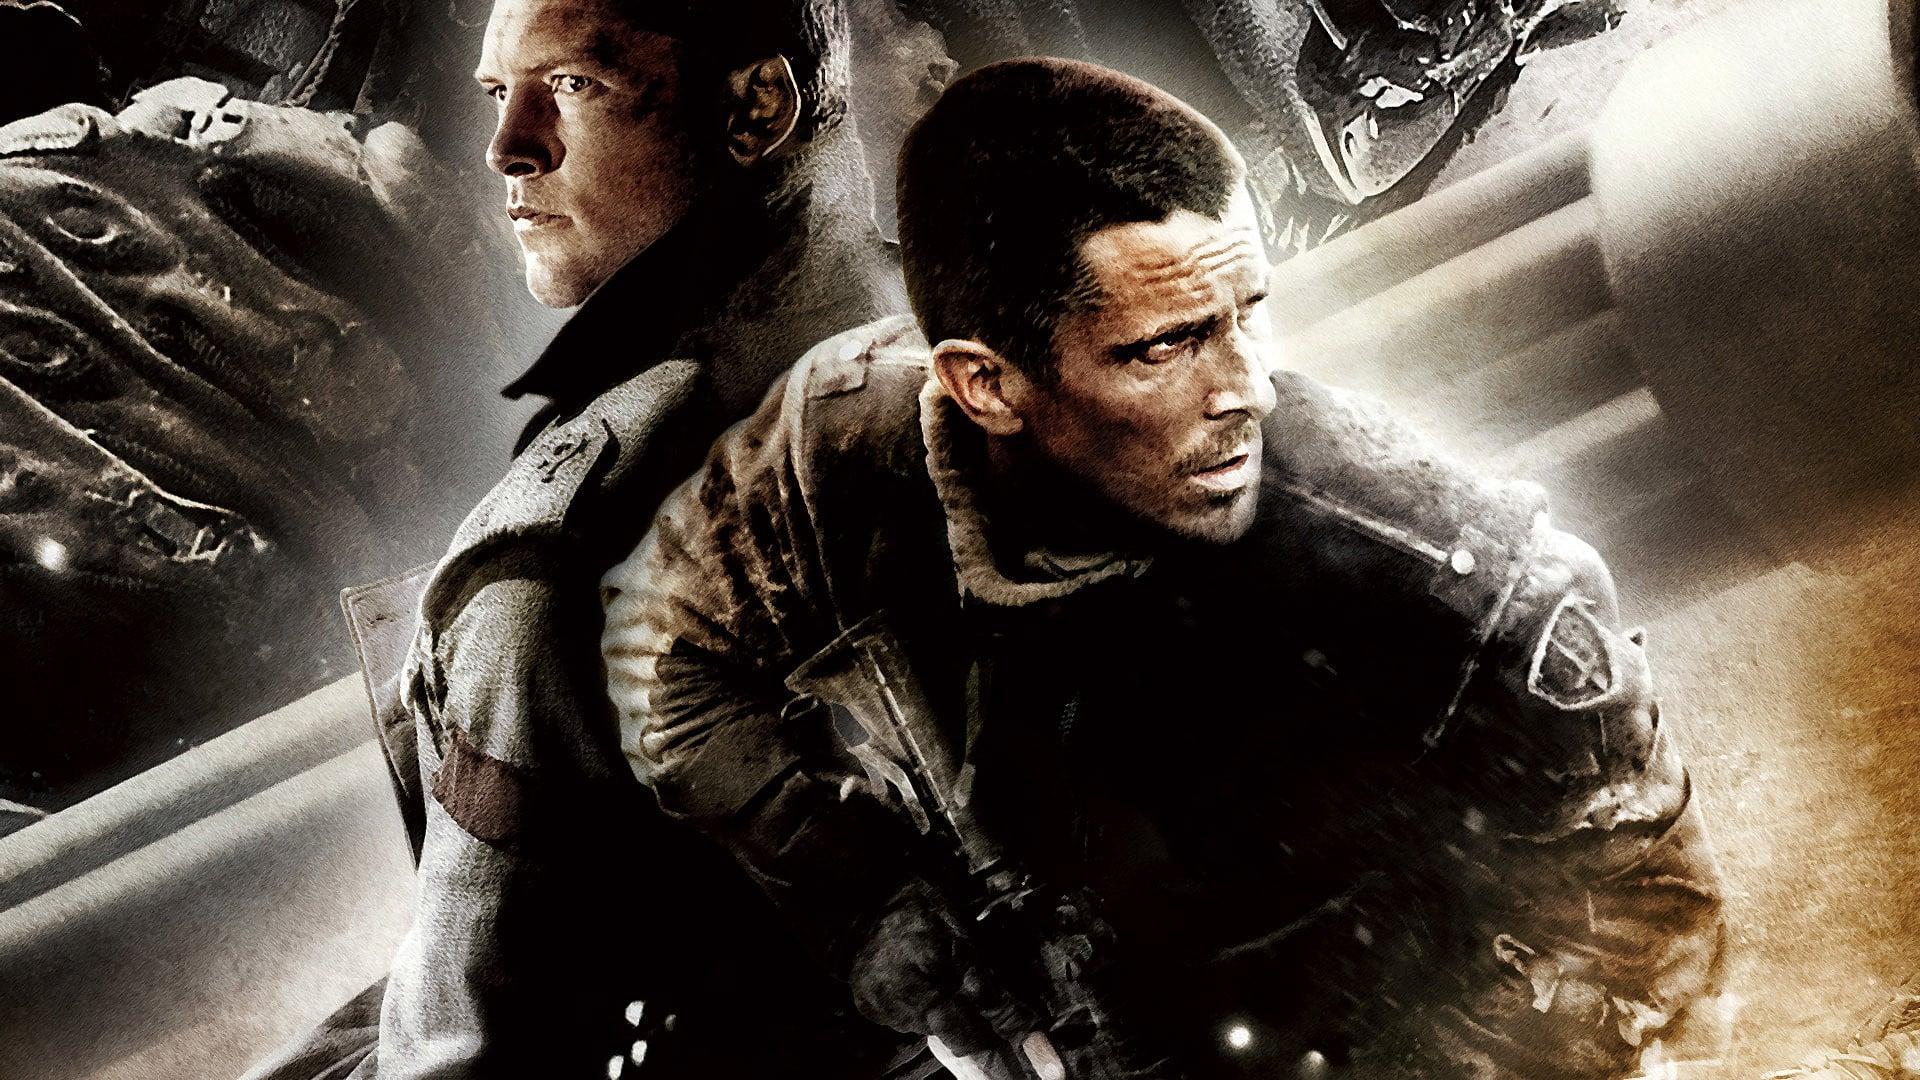 Terminator Salvation Movie Streaming Online Watch on Amazon, Google Play, Netflix , Youtube